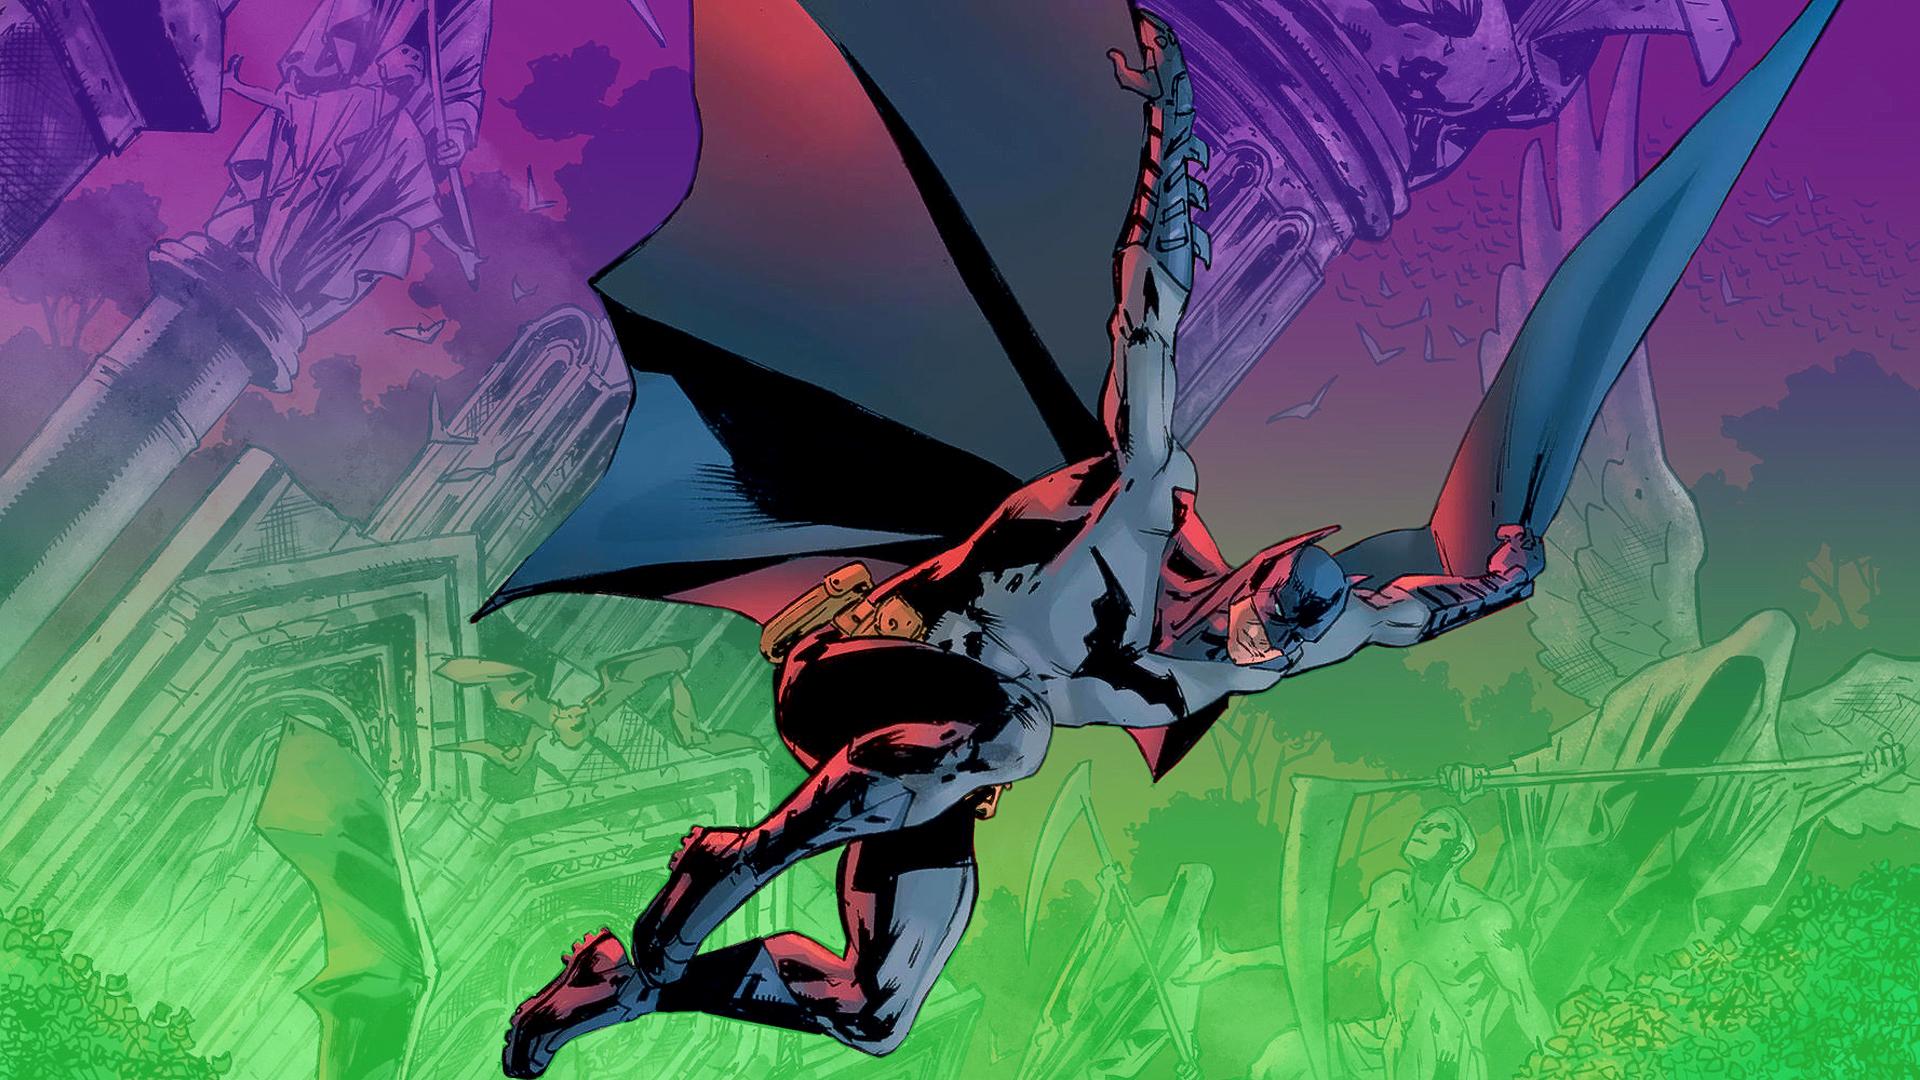 Comic book cover featuring Batman jumping